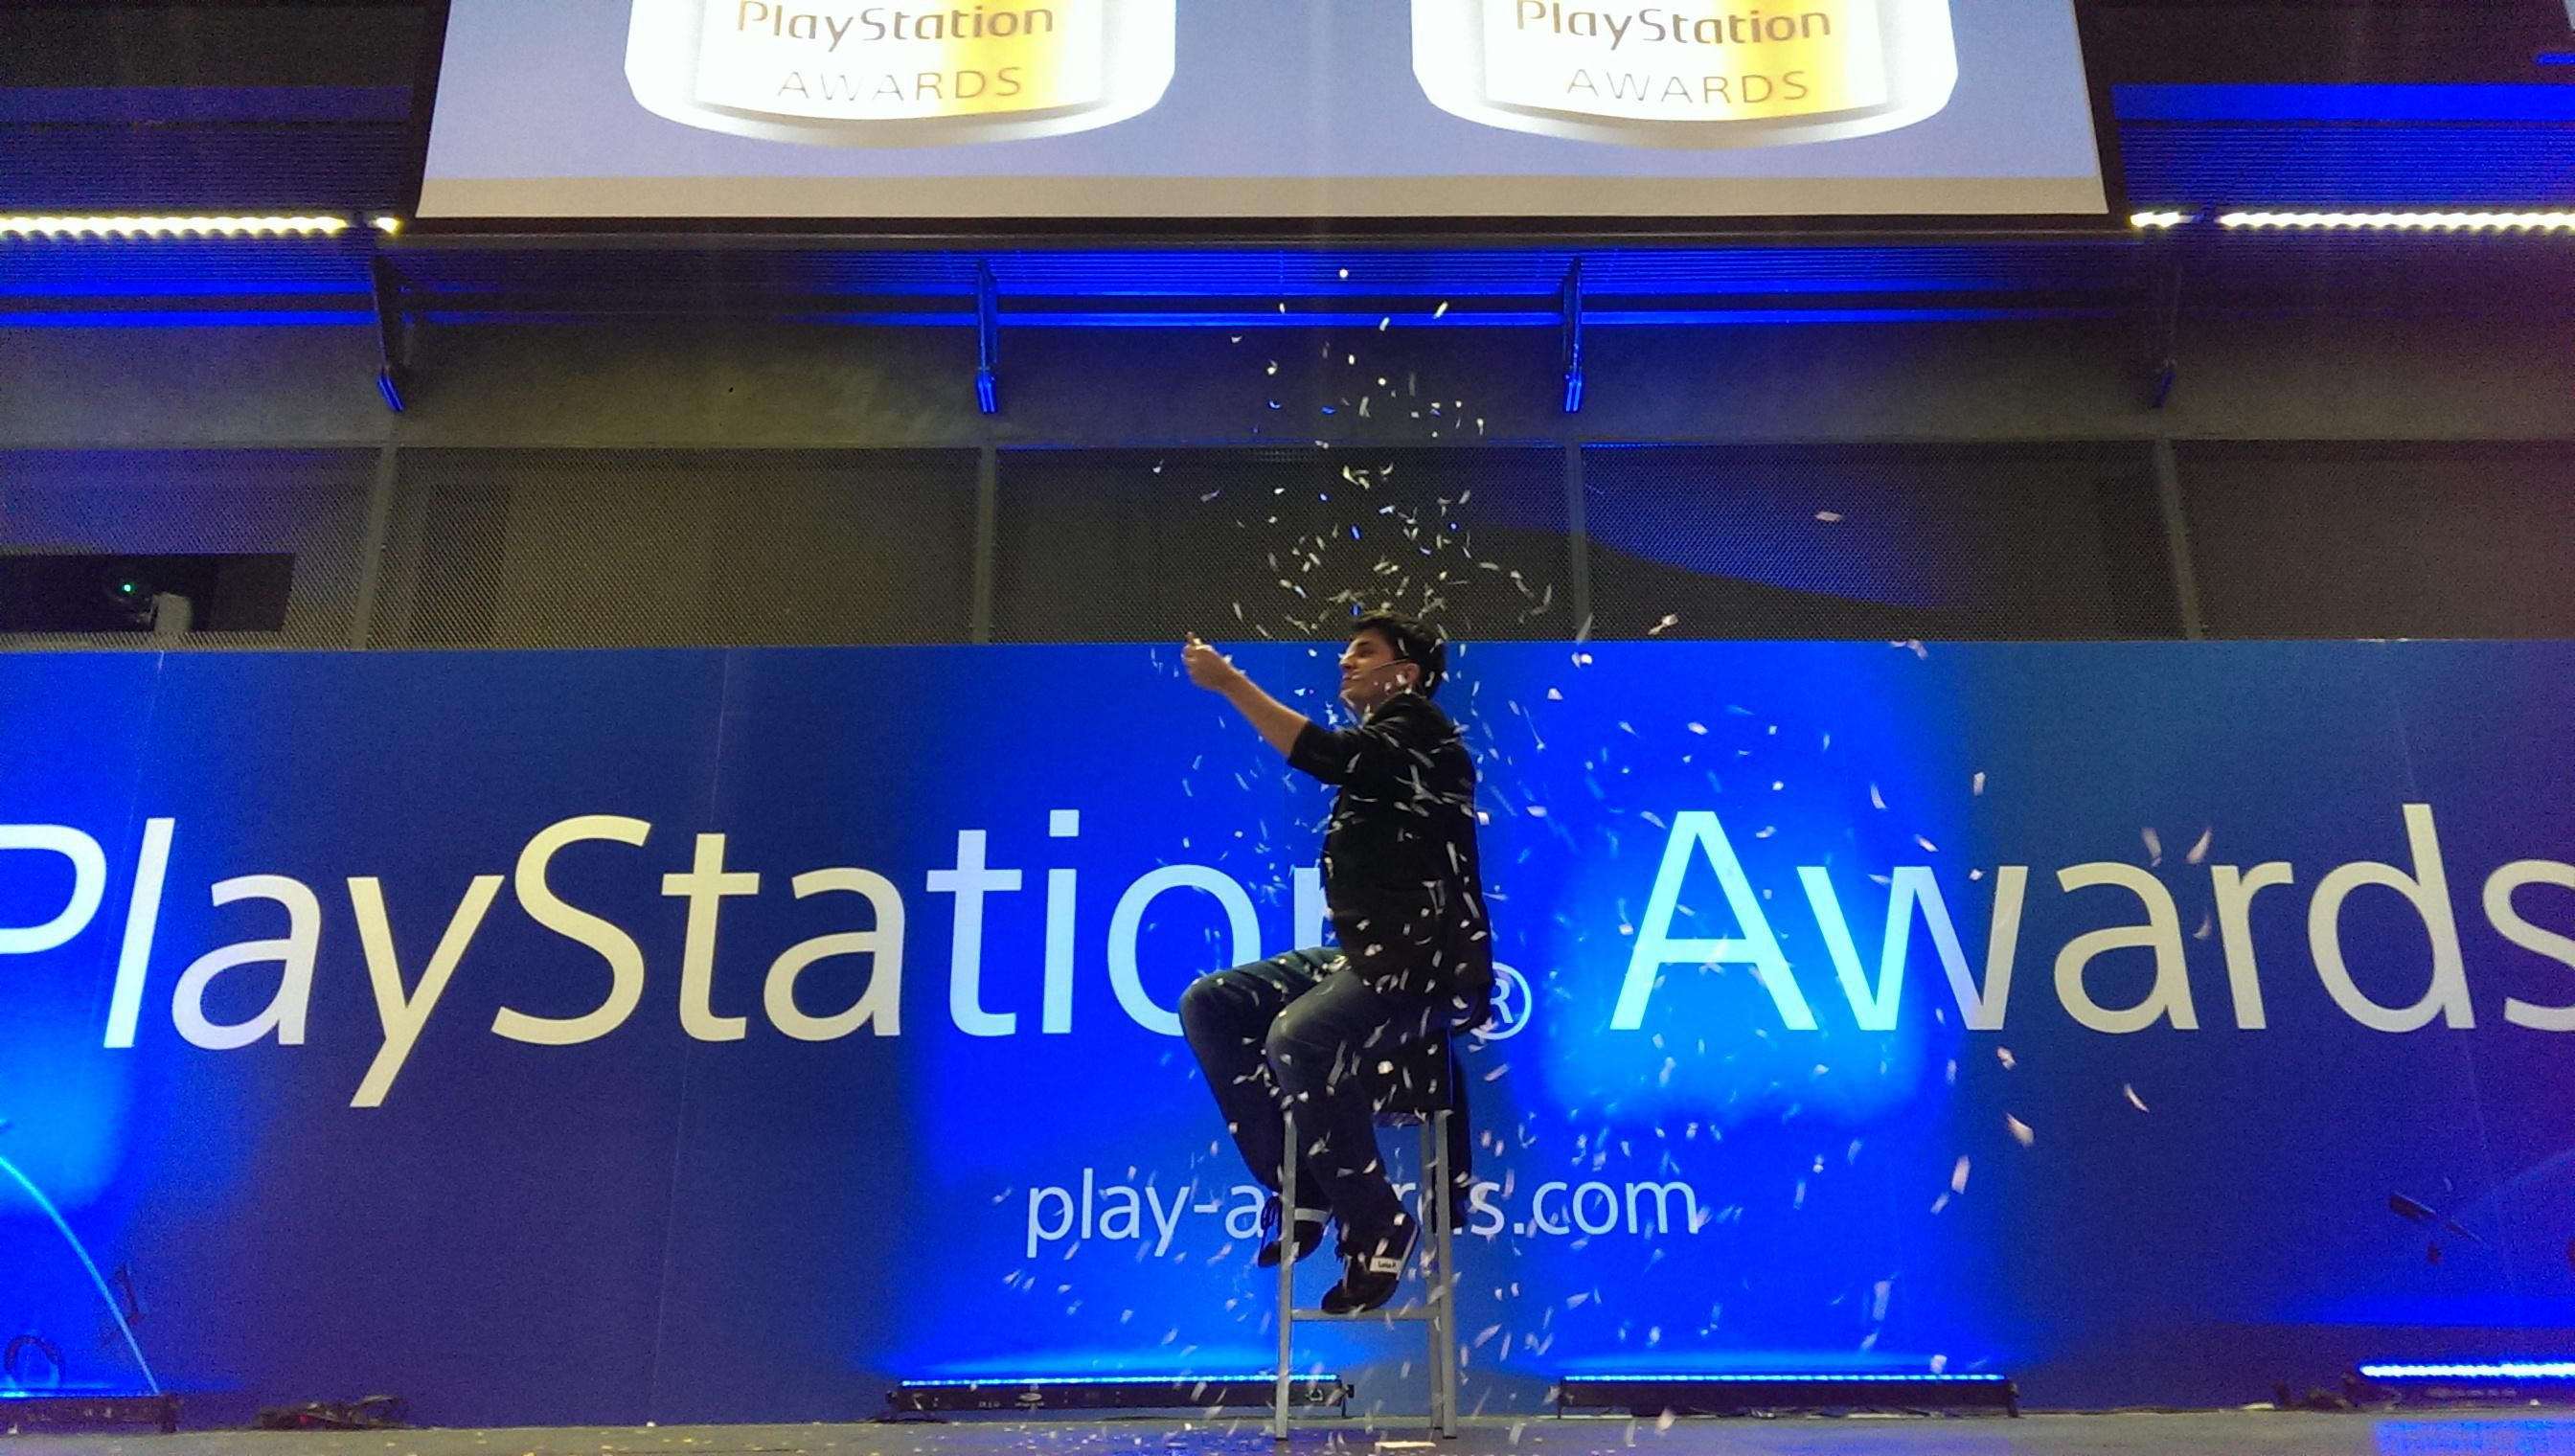 Playstation awards 2015 in diretta streaming alle 9 00 for Diretta notizie